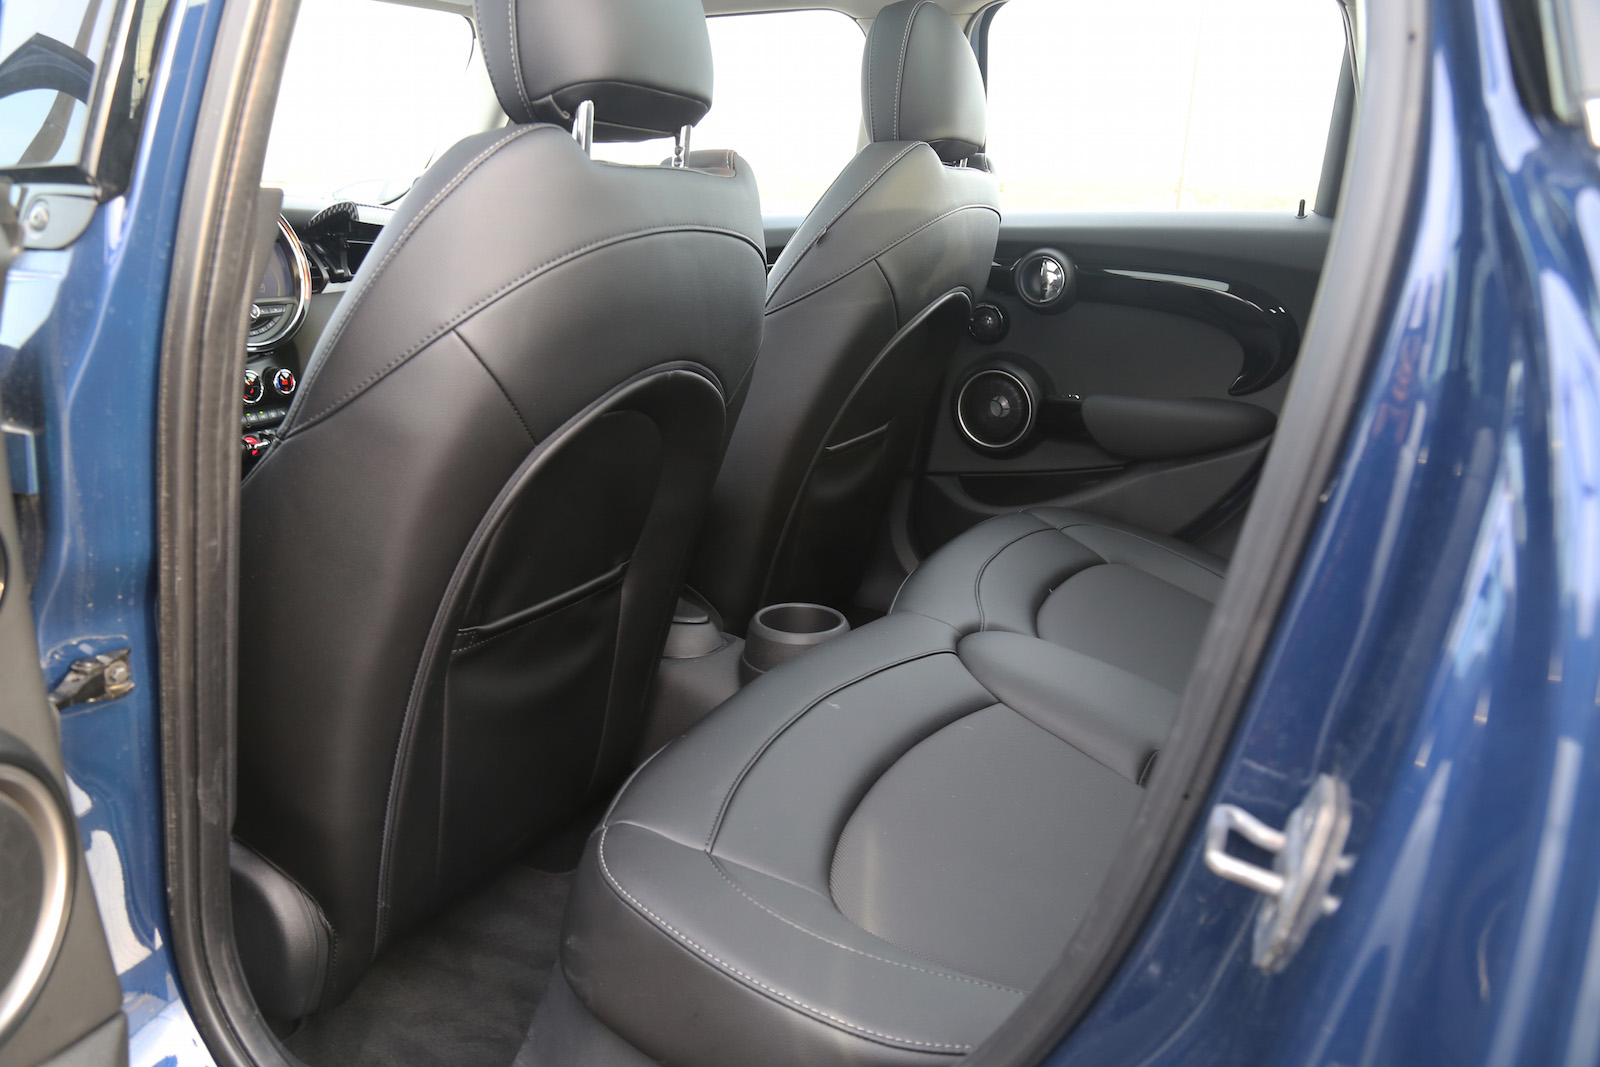 review 2015 mini cooper s 5 door canadian auto review. Black Bedroom Furniture Sets. Home Design Ideas